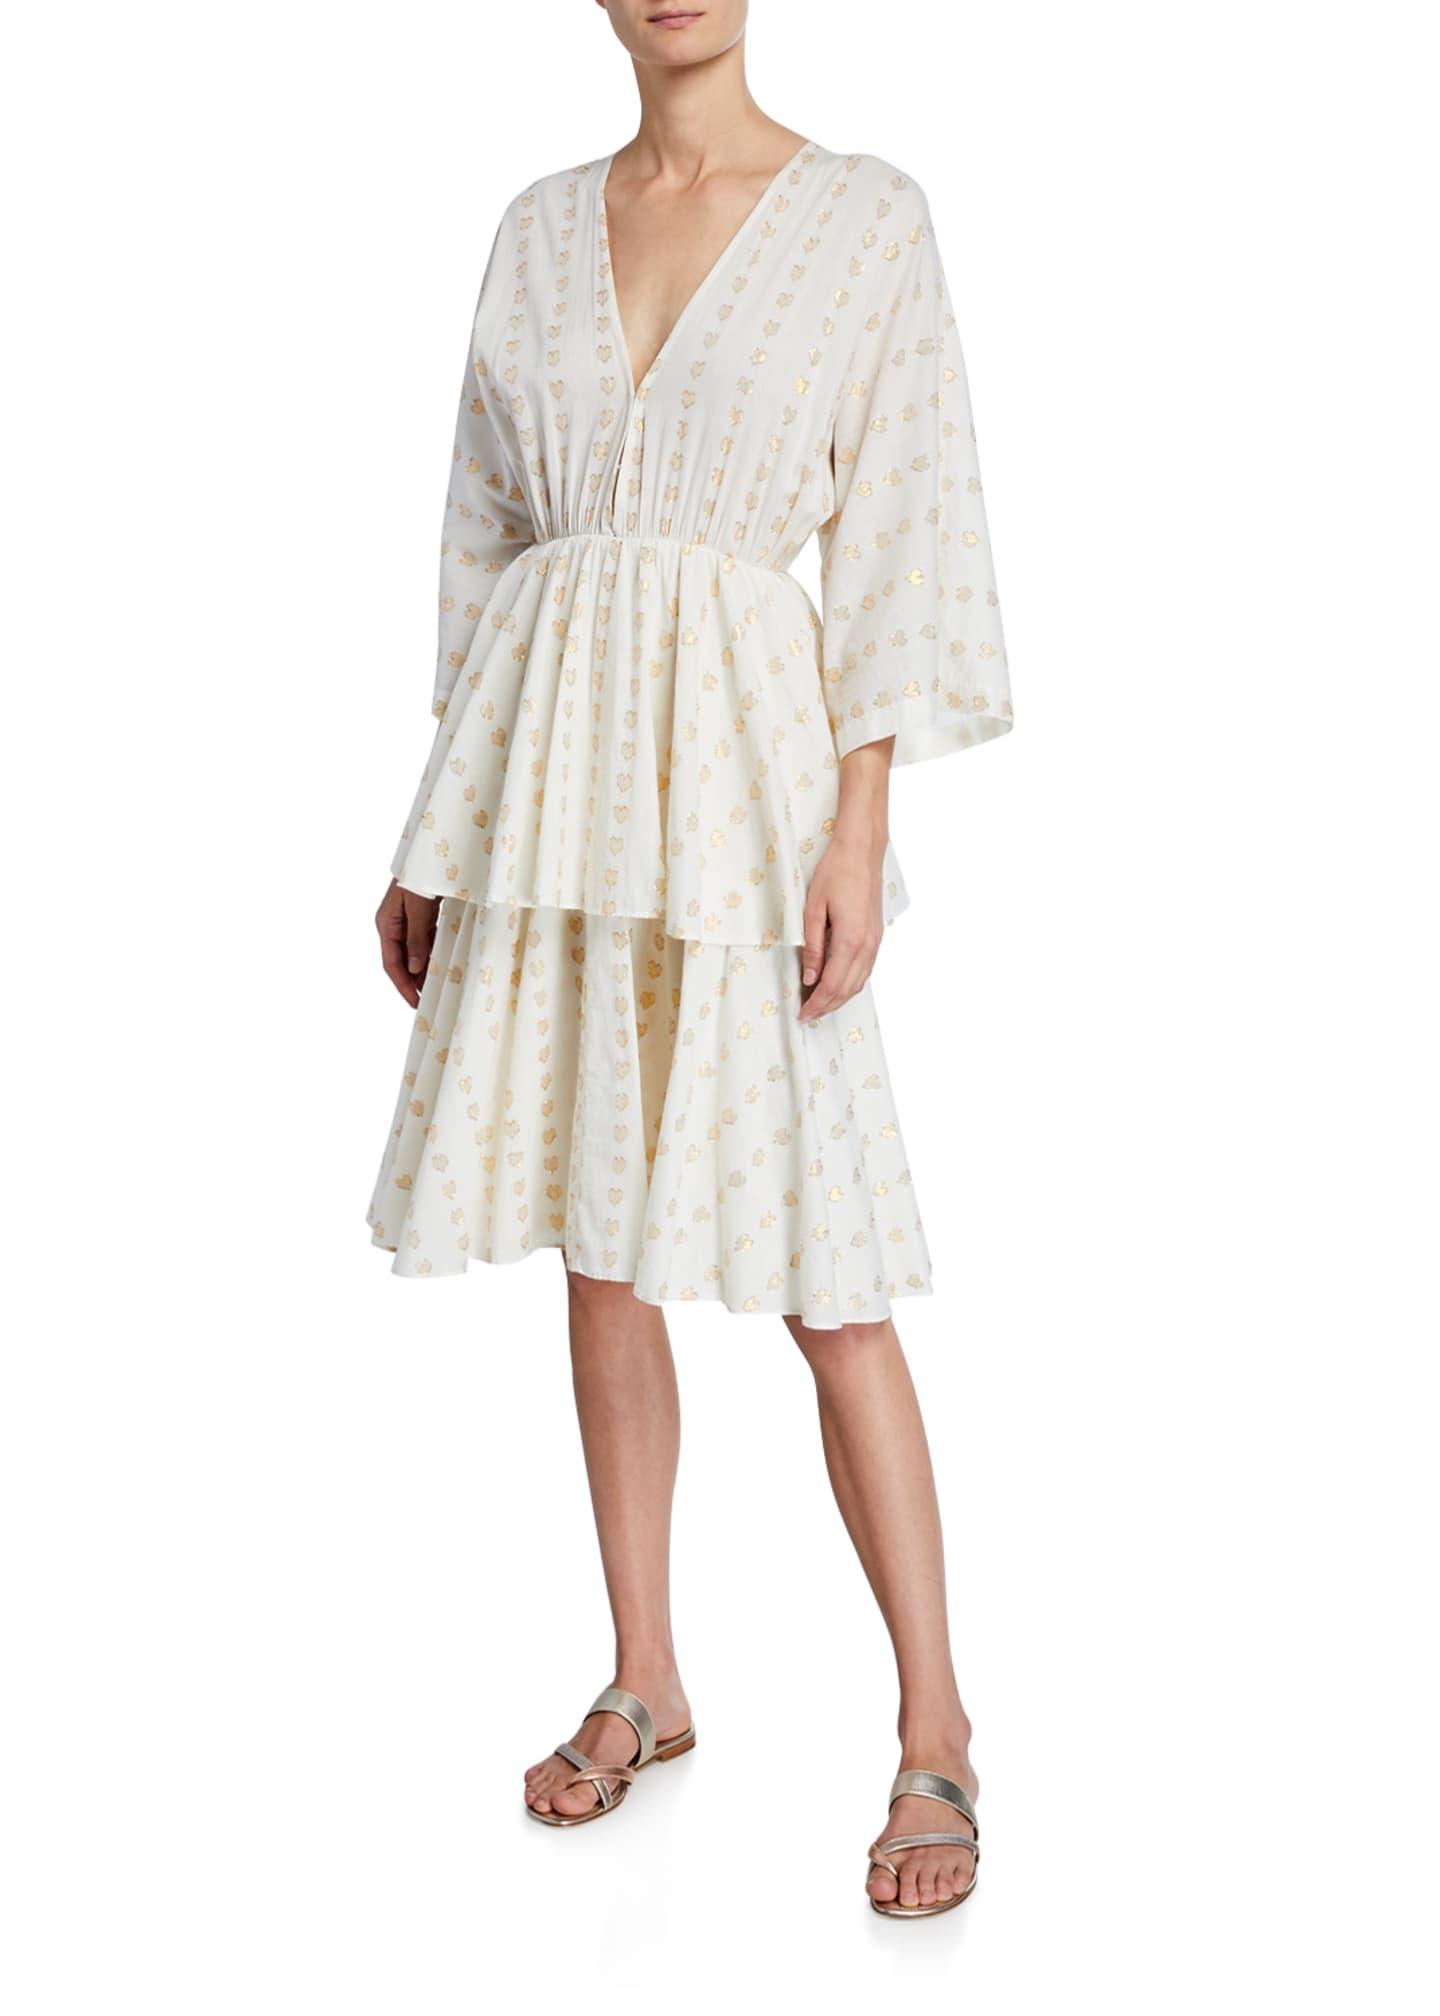 Rhode Bella Heart V-Neck 3/4-Sleeve Tiered Cotton Dress